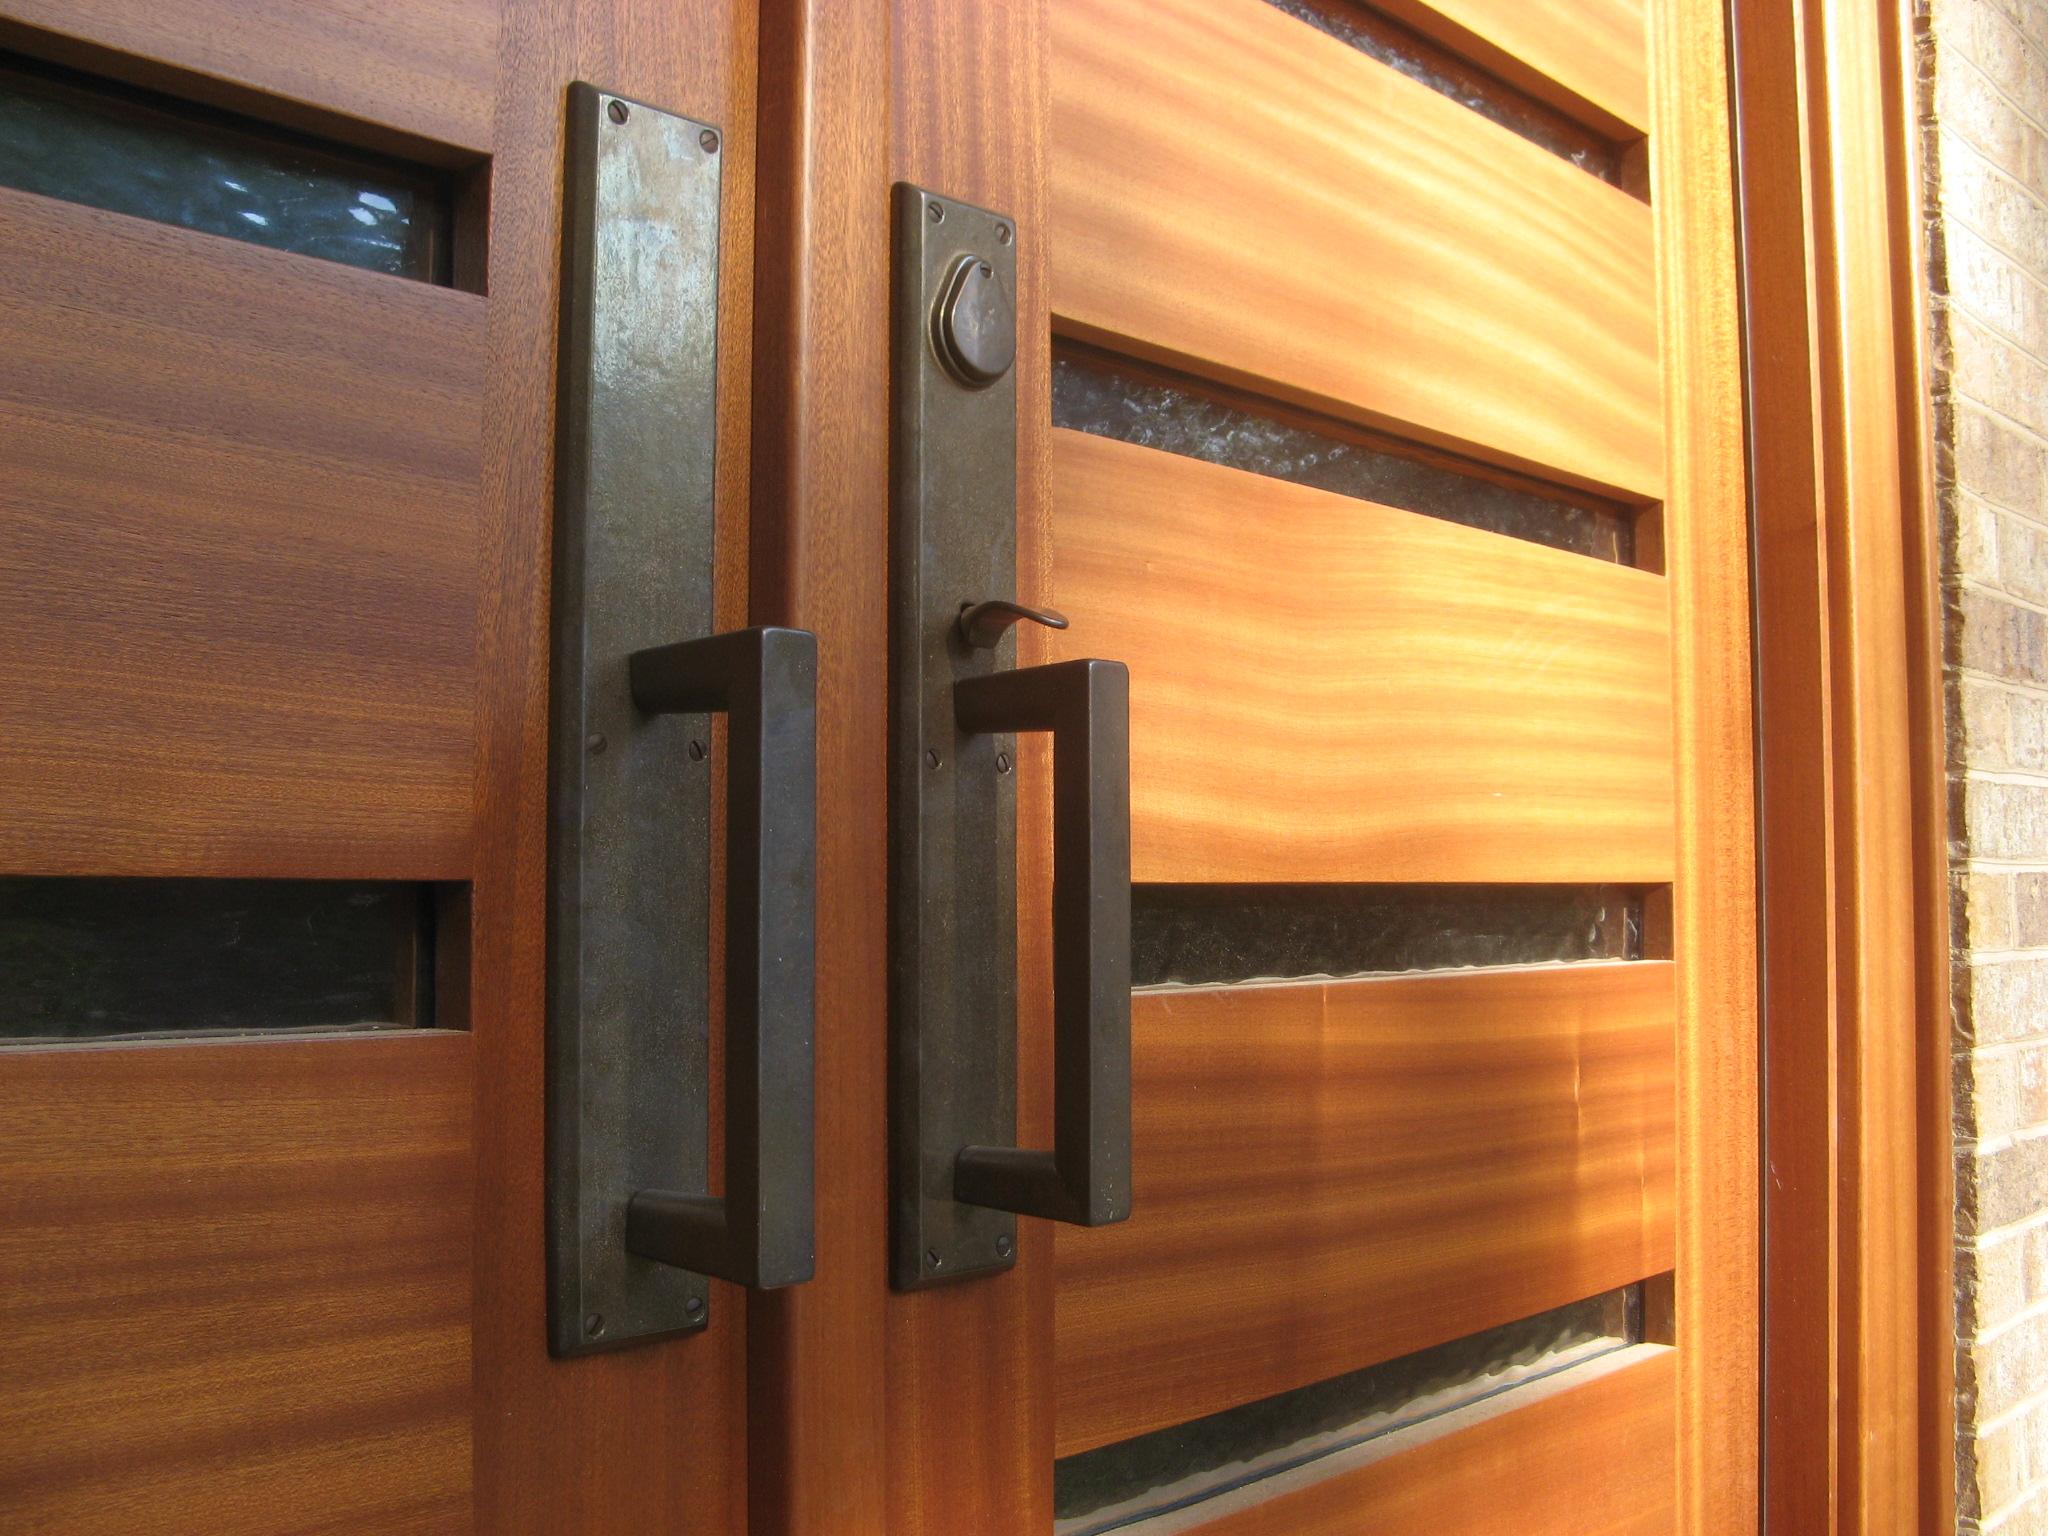 entrance-doors-designs-house-main-door-interior-design-l-bdcbfaacb.jpg